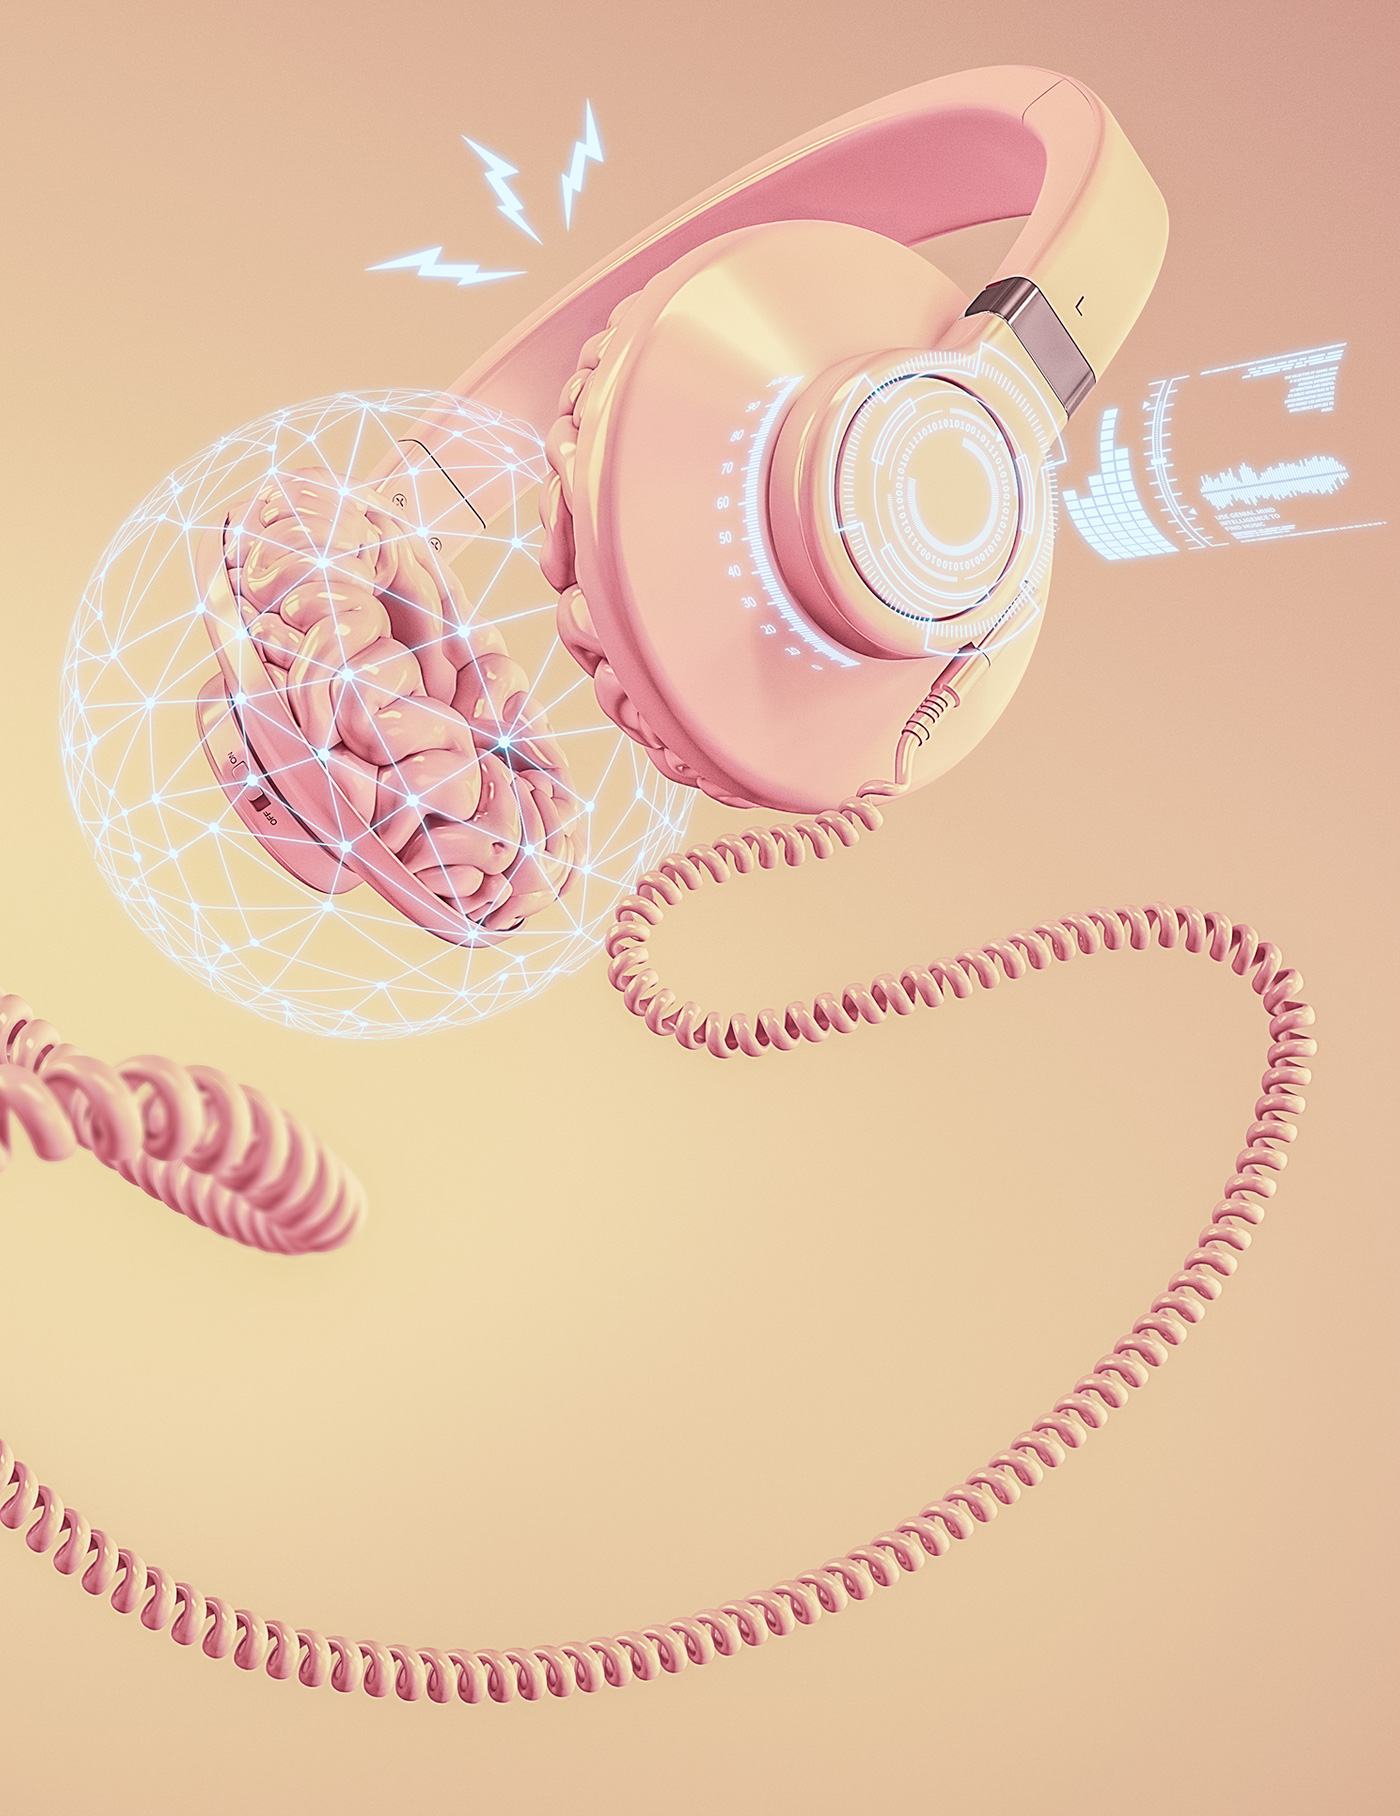 brain headphone sound ia Technology Cerebro musica genial mind artificial intelligence Inteligencia Artificial